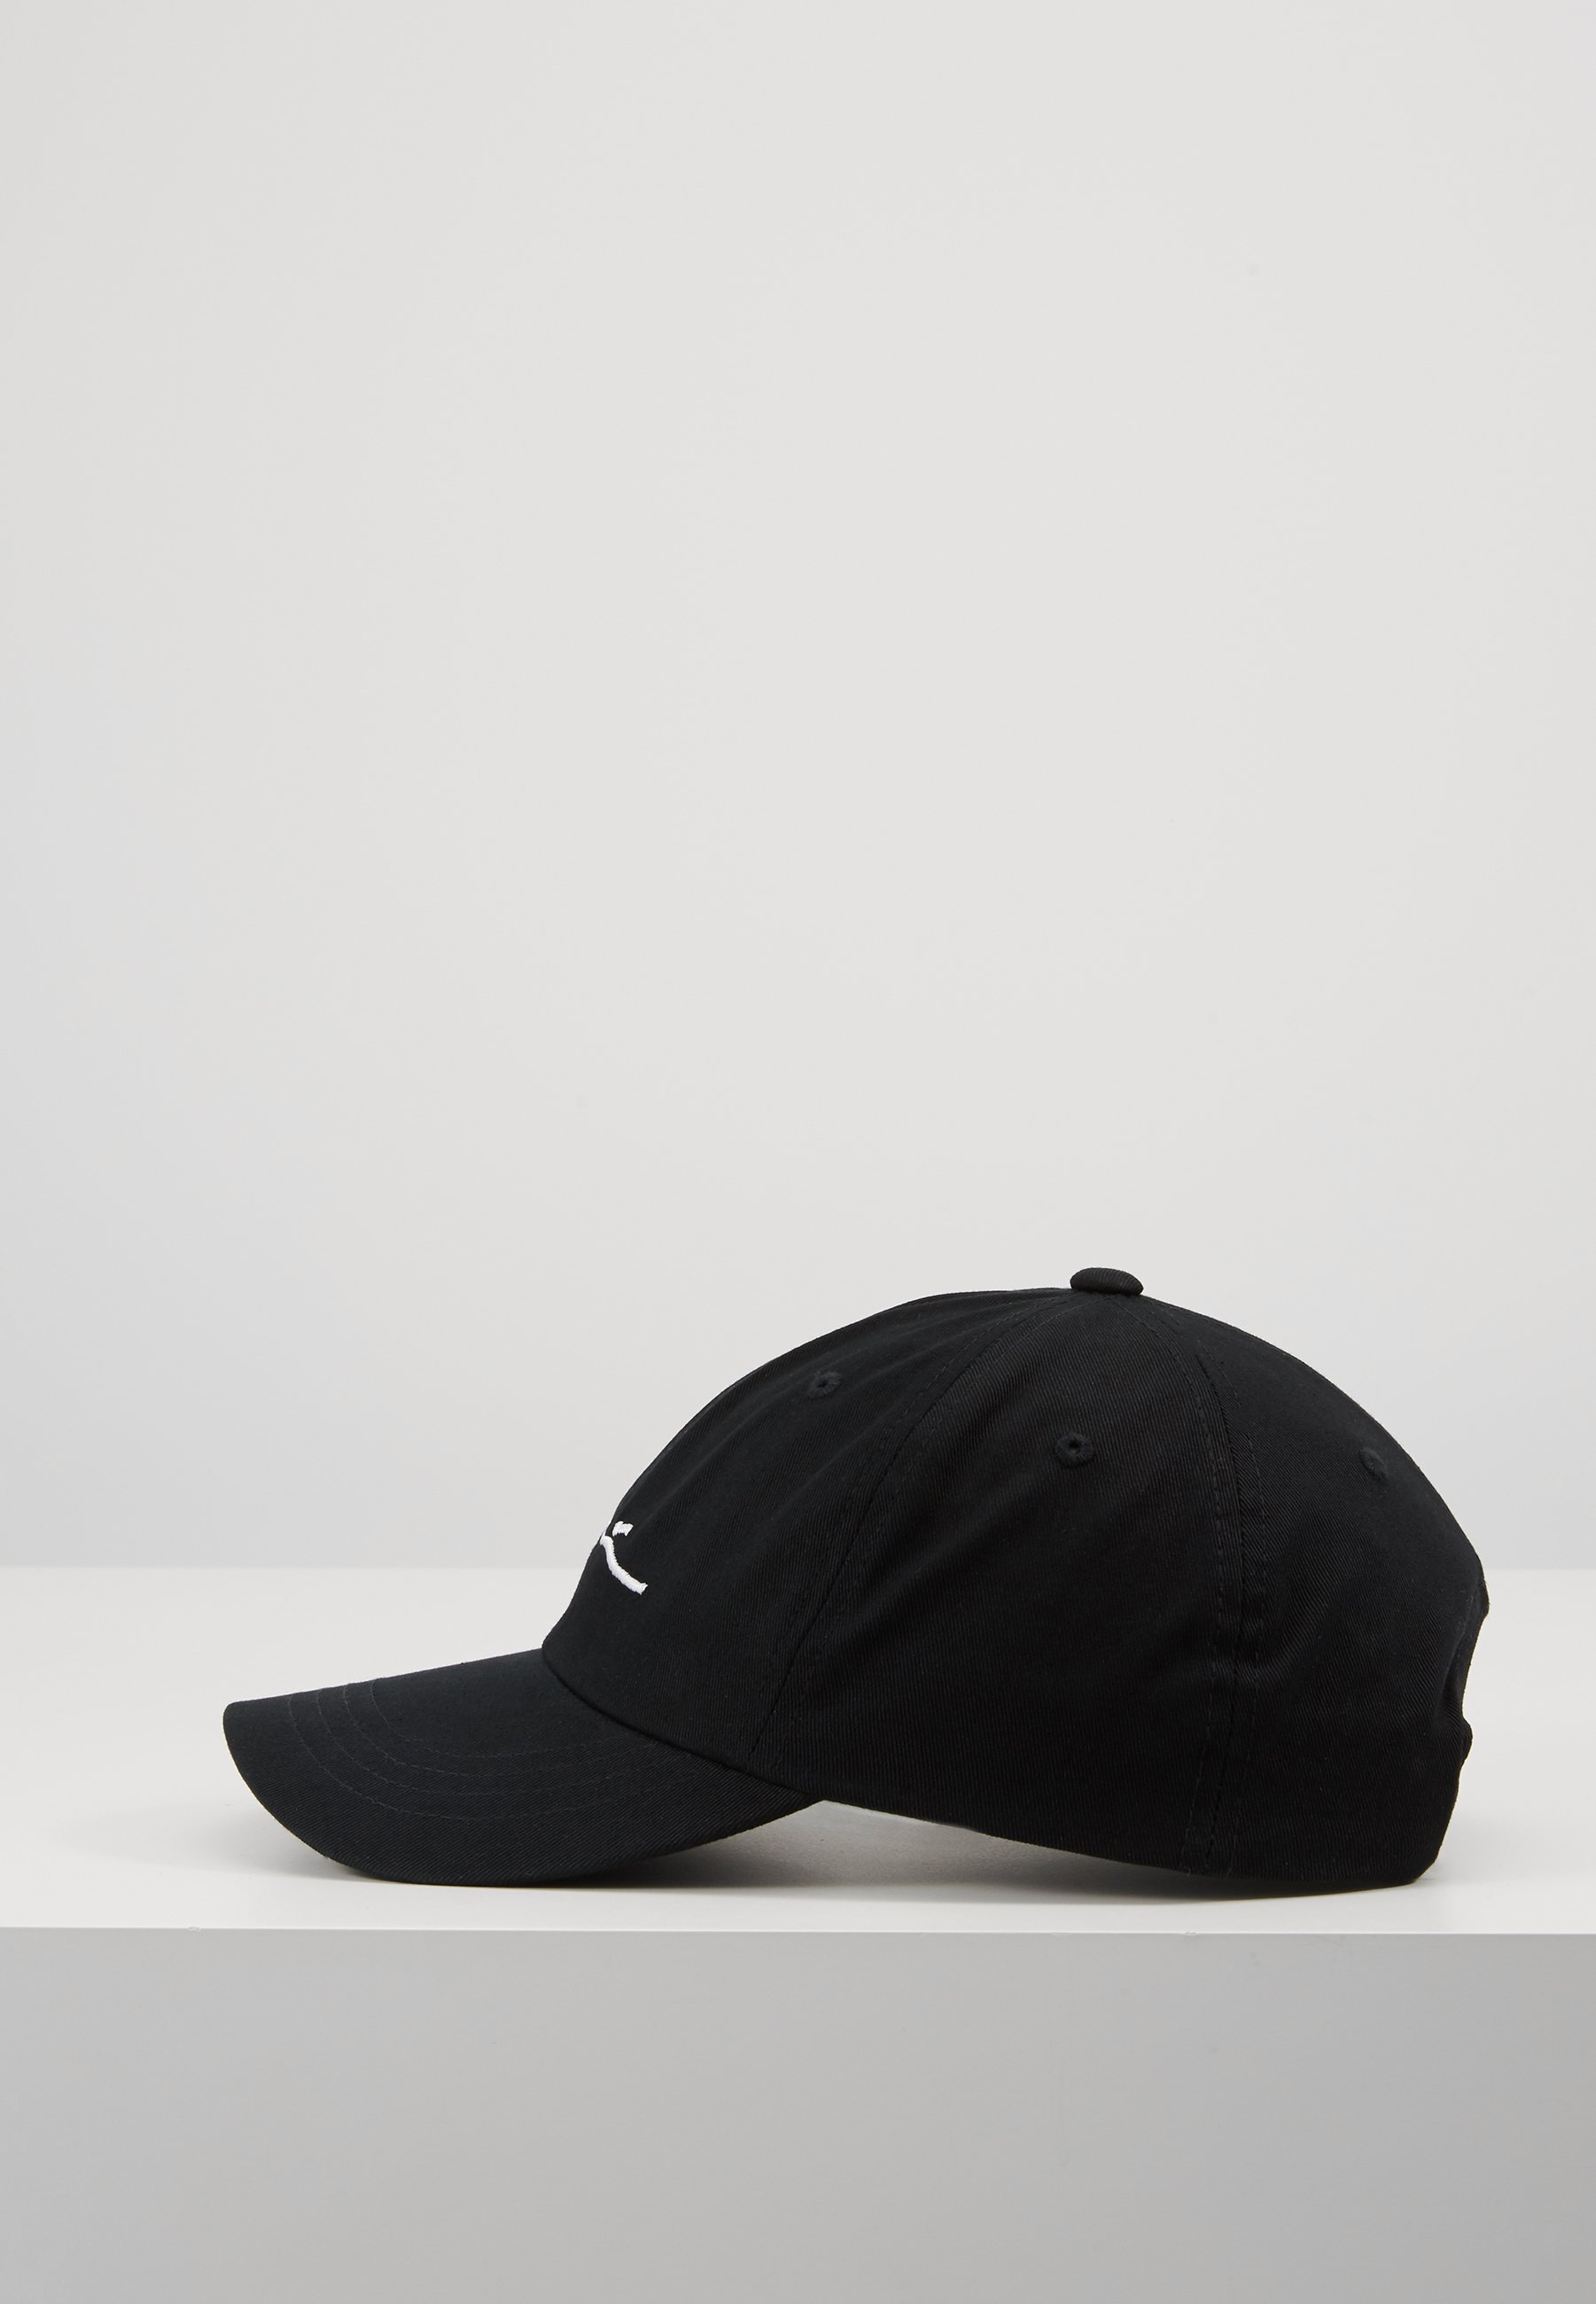 Karl Kani SIGNATURE - Cap - black/white/svart zIwULhHX8CLdcx1